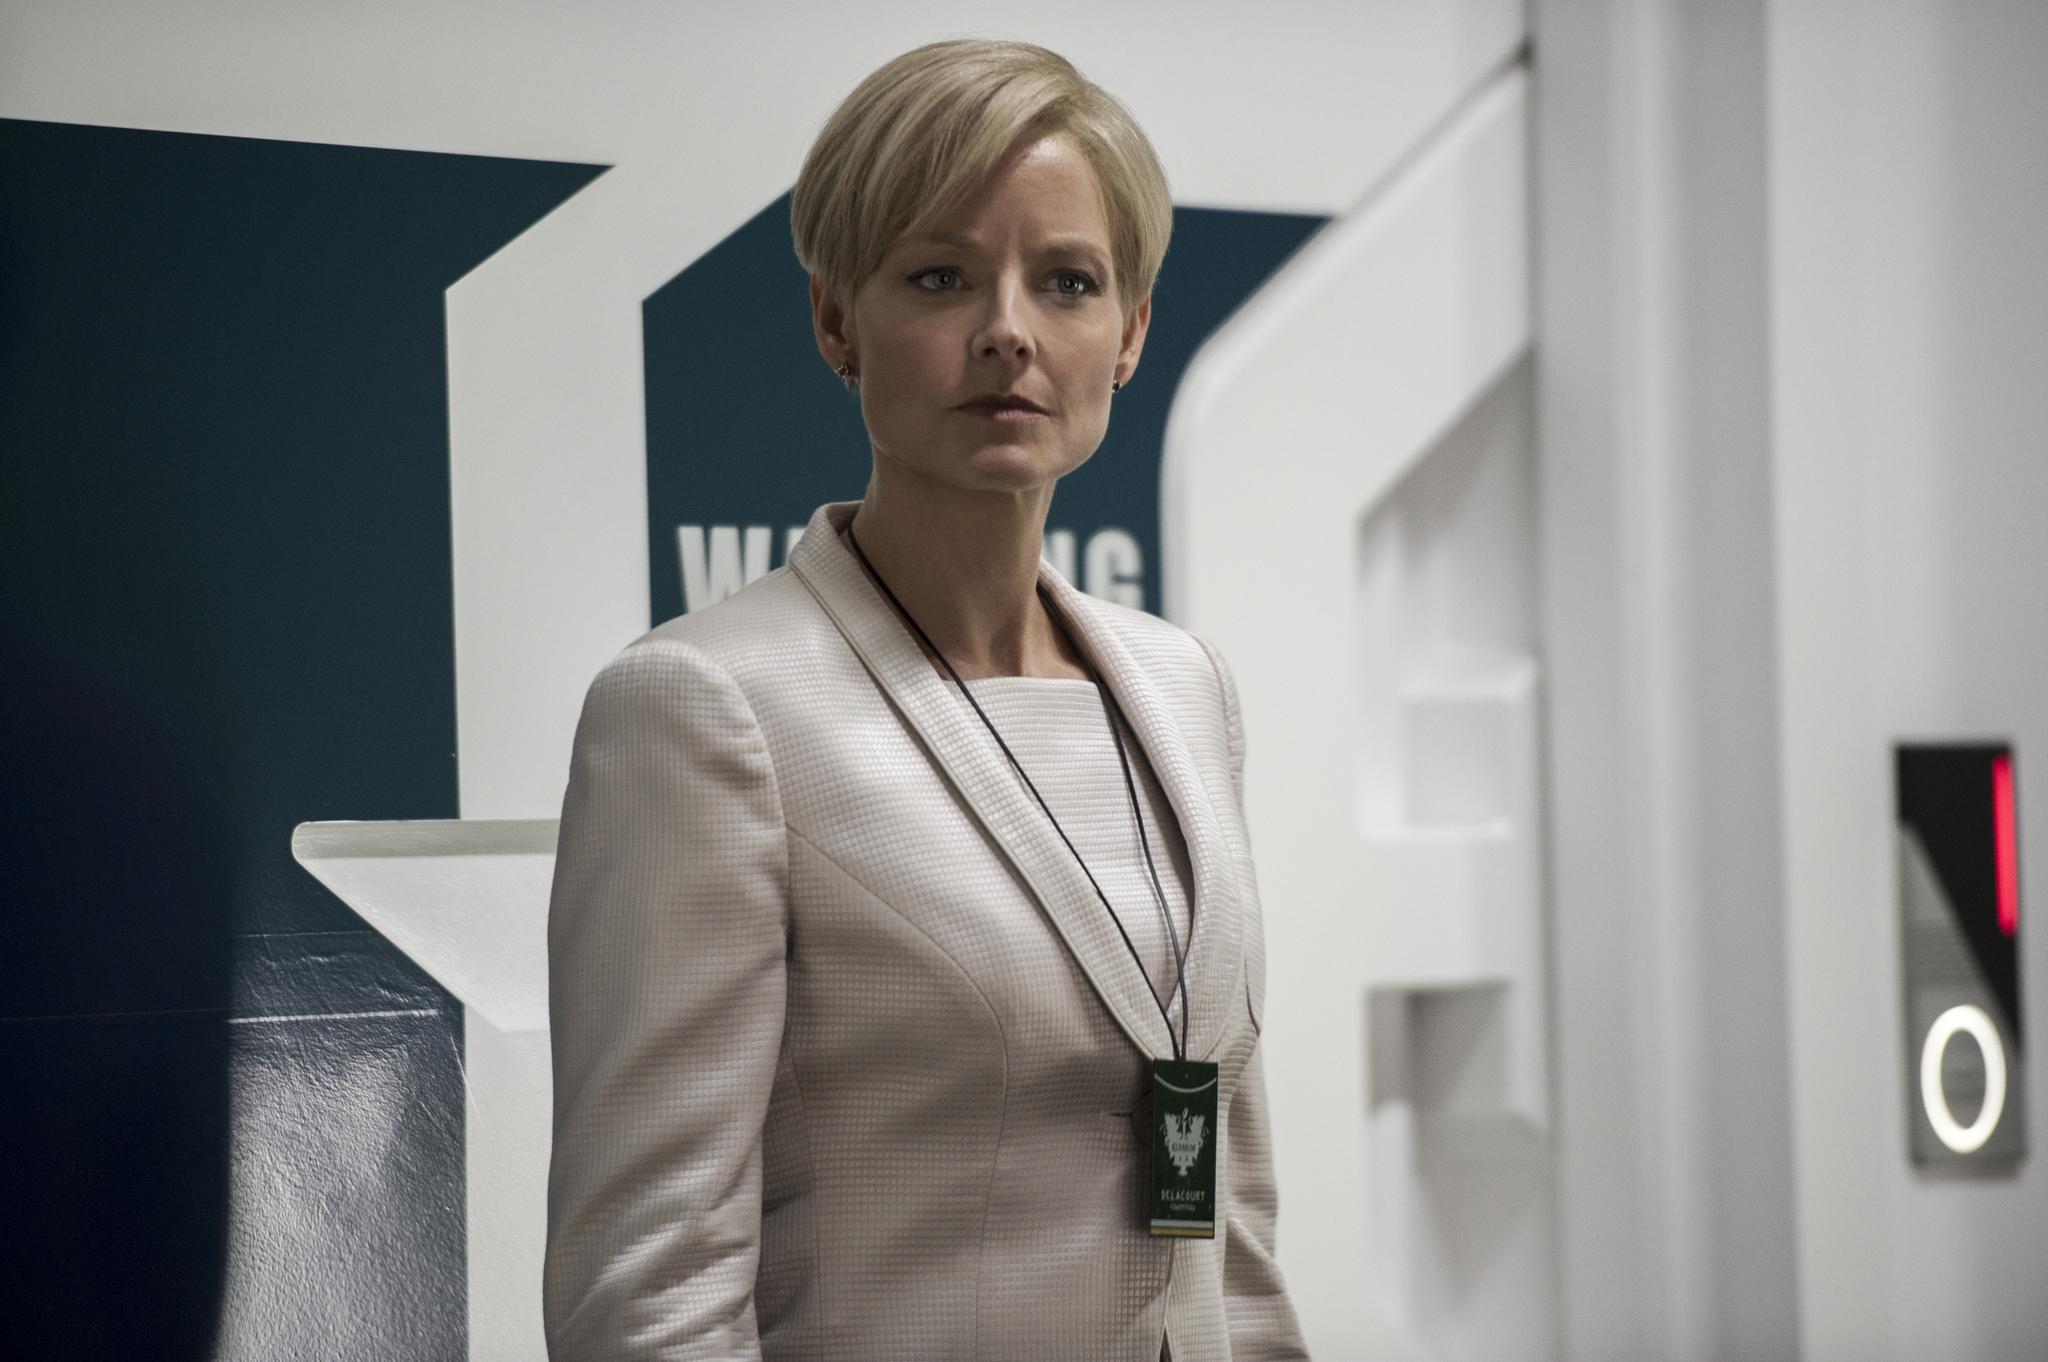 Jodie Foster in Elysium (2013)